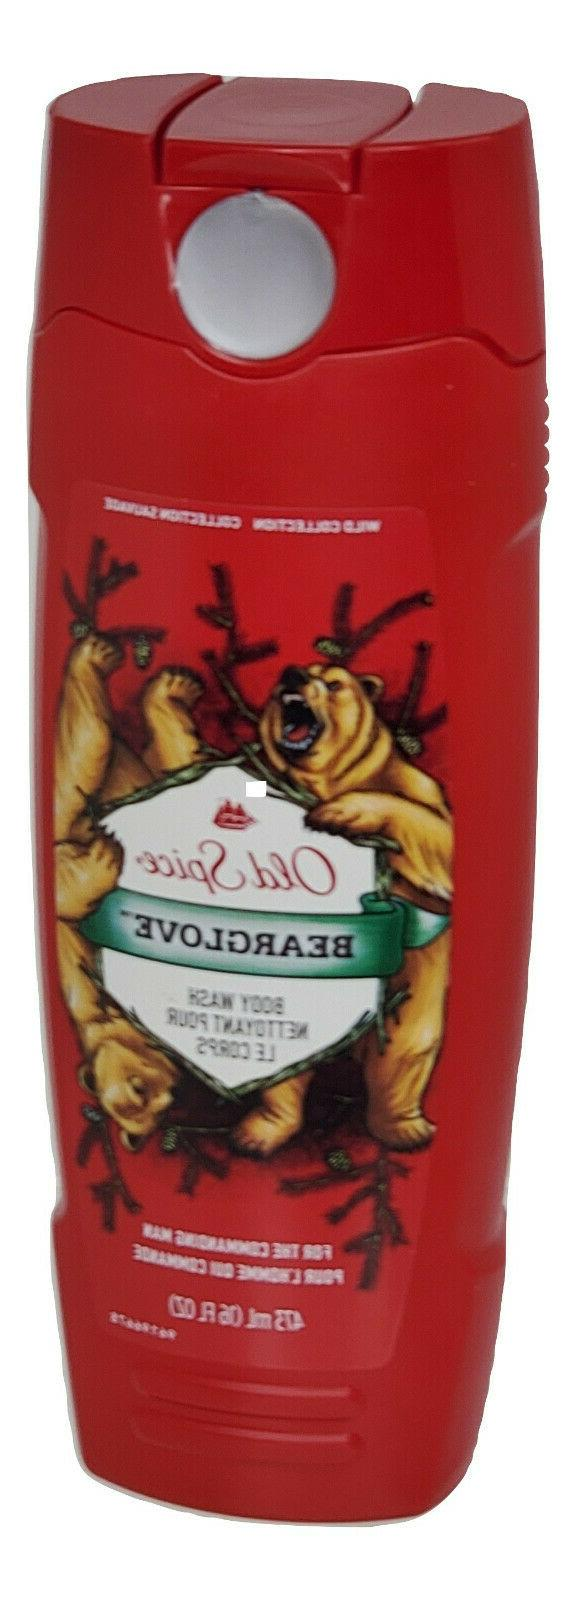 Old Spice Wild Collection Bodywash, Bearglove 16 oz